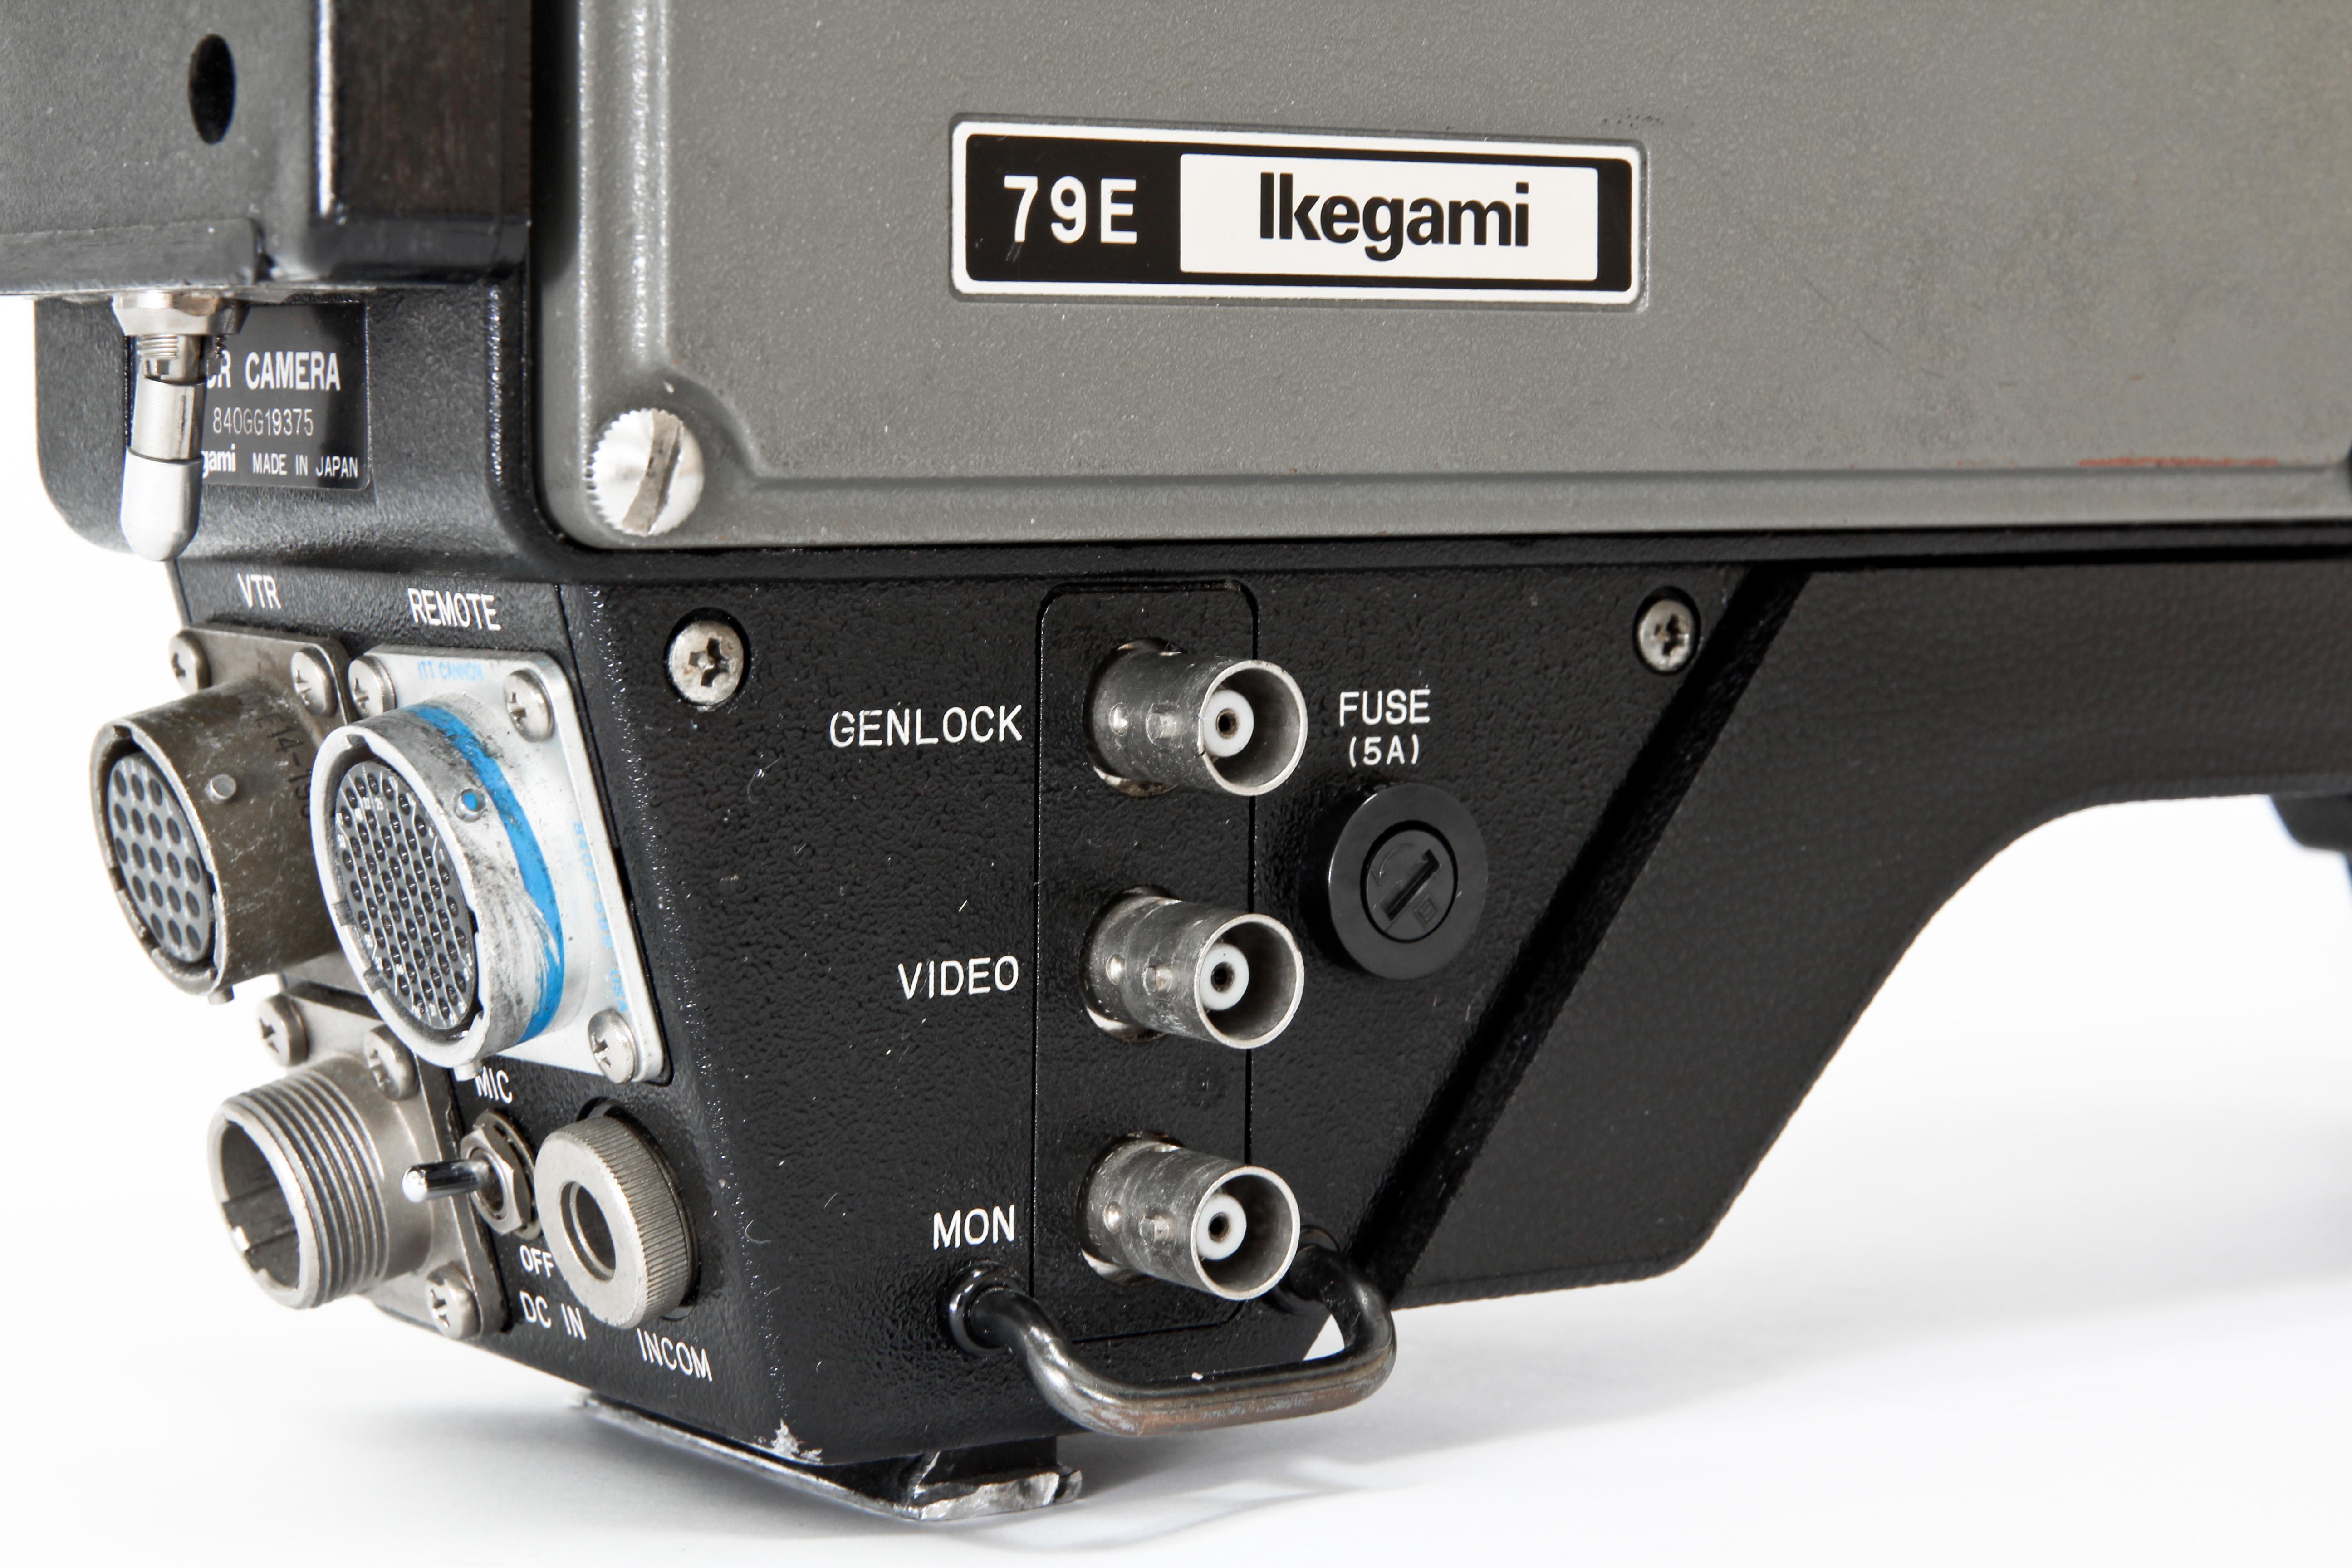 Ikegami HL-79E -  (16 von 18)